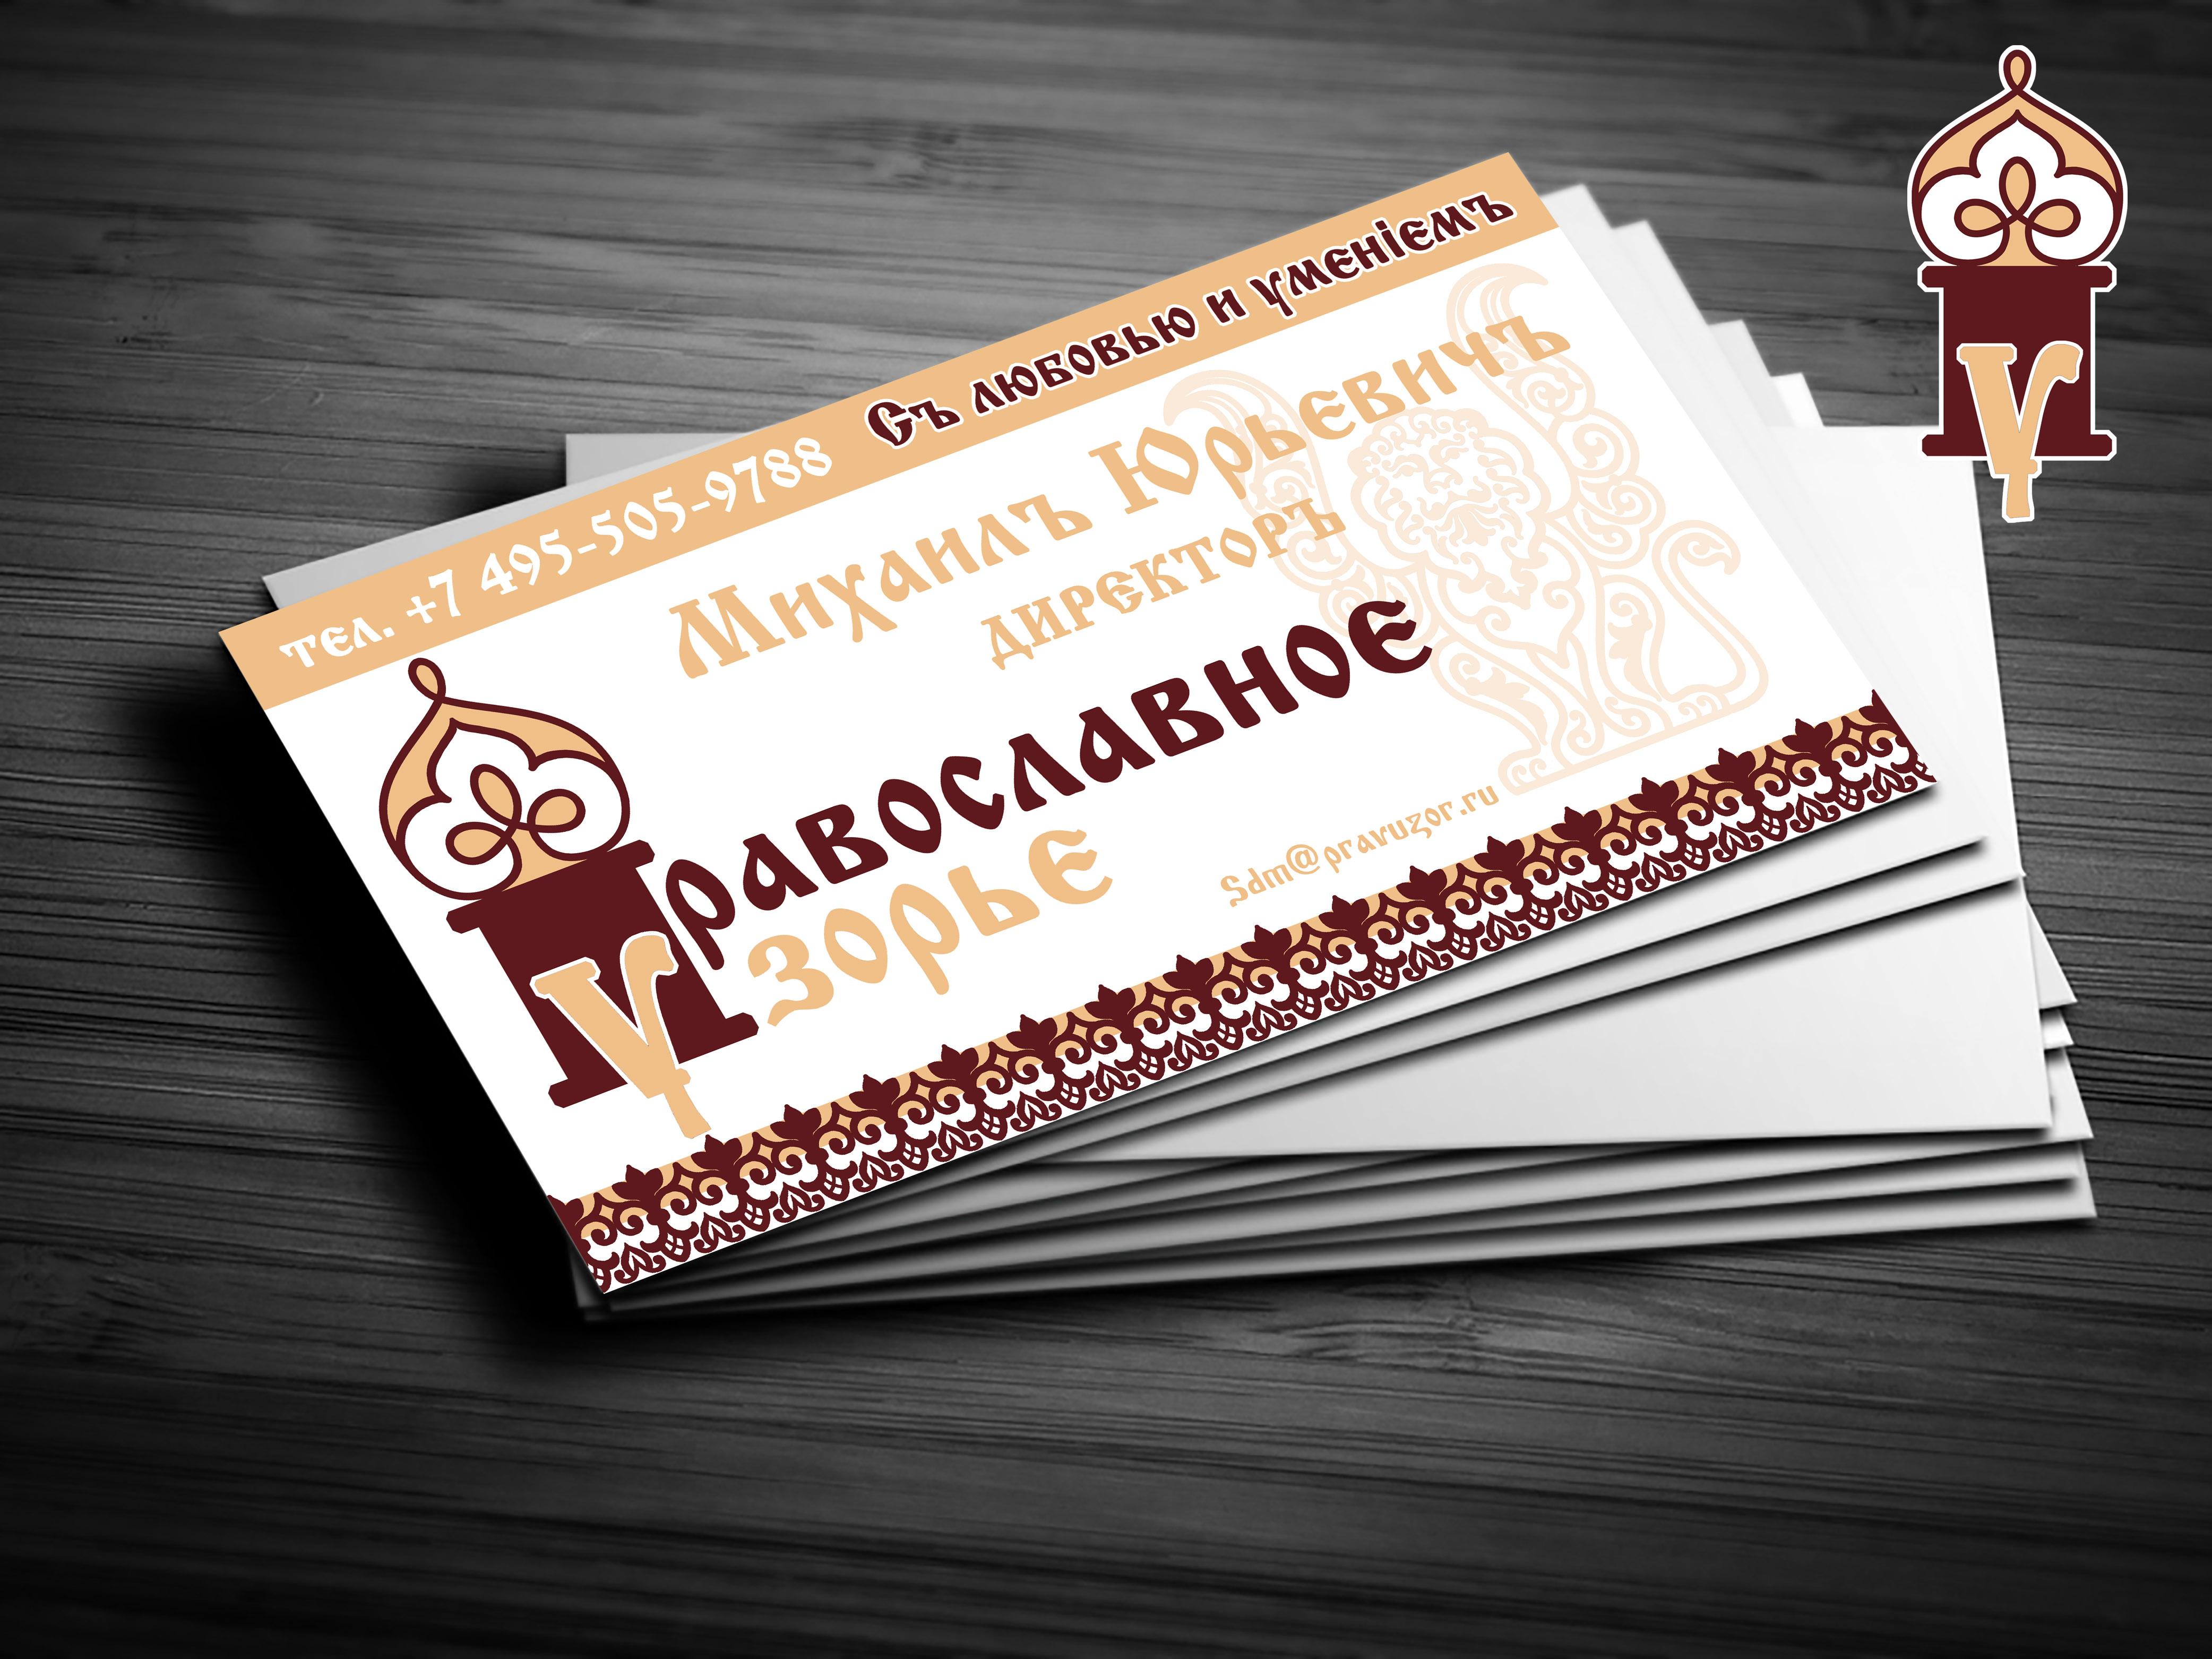 Логотип + визитка + сайт фото f_0345b032240c16a9.jpg